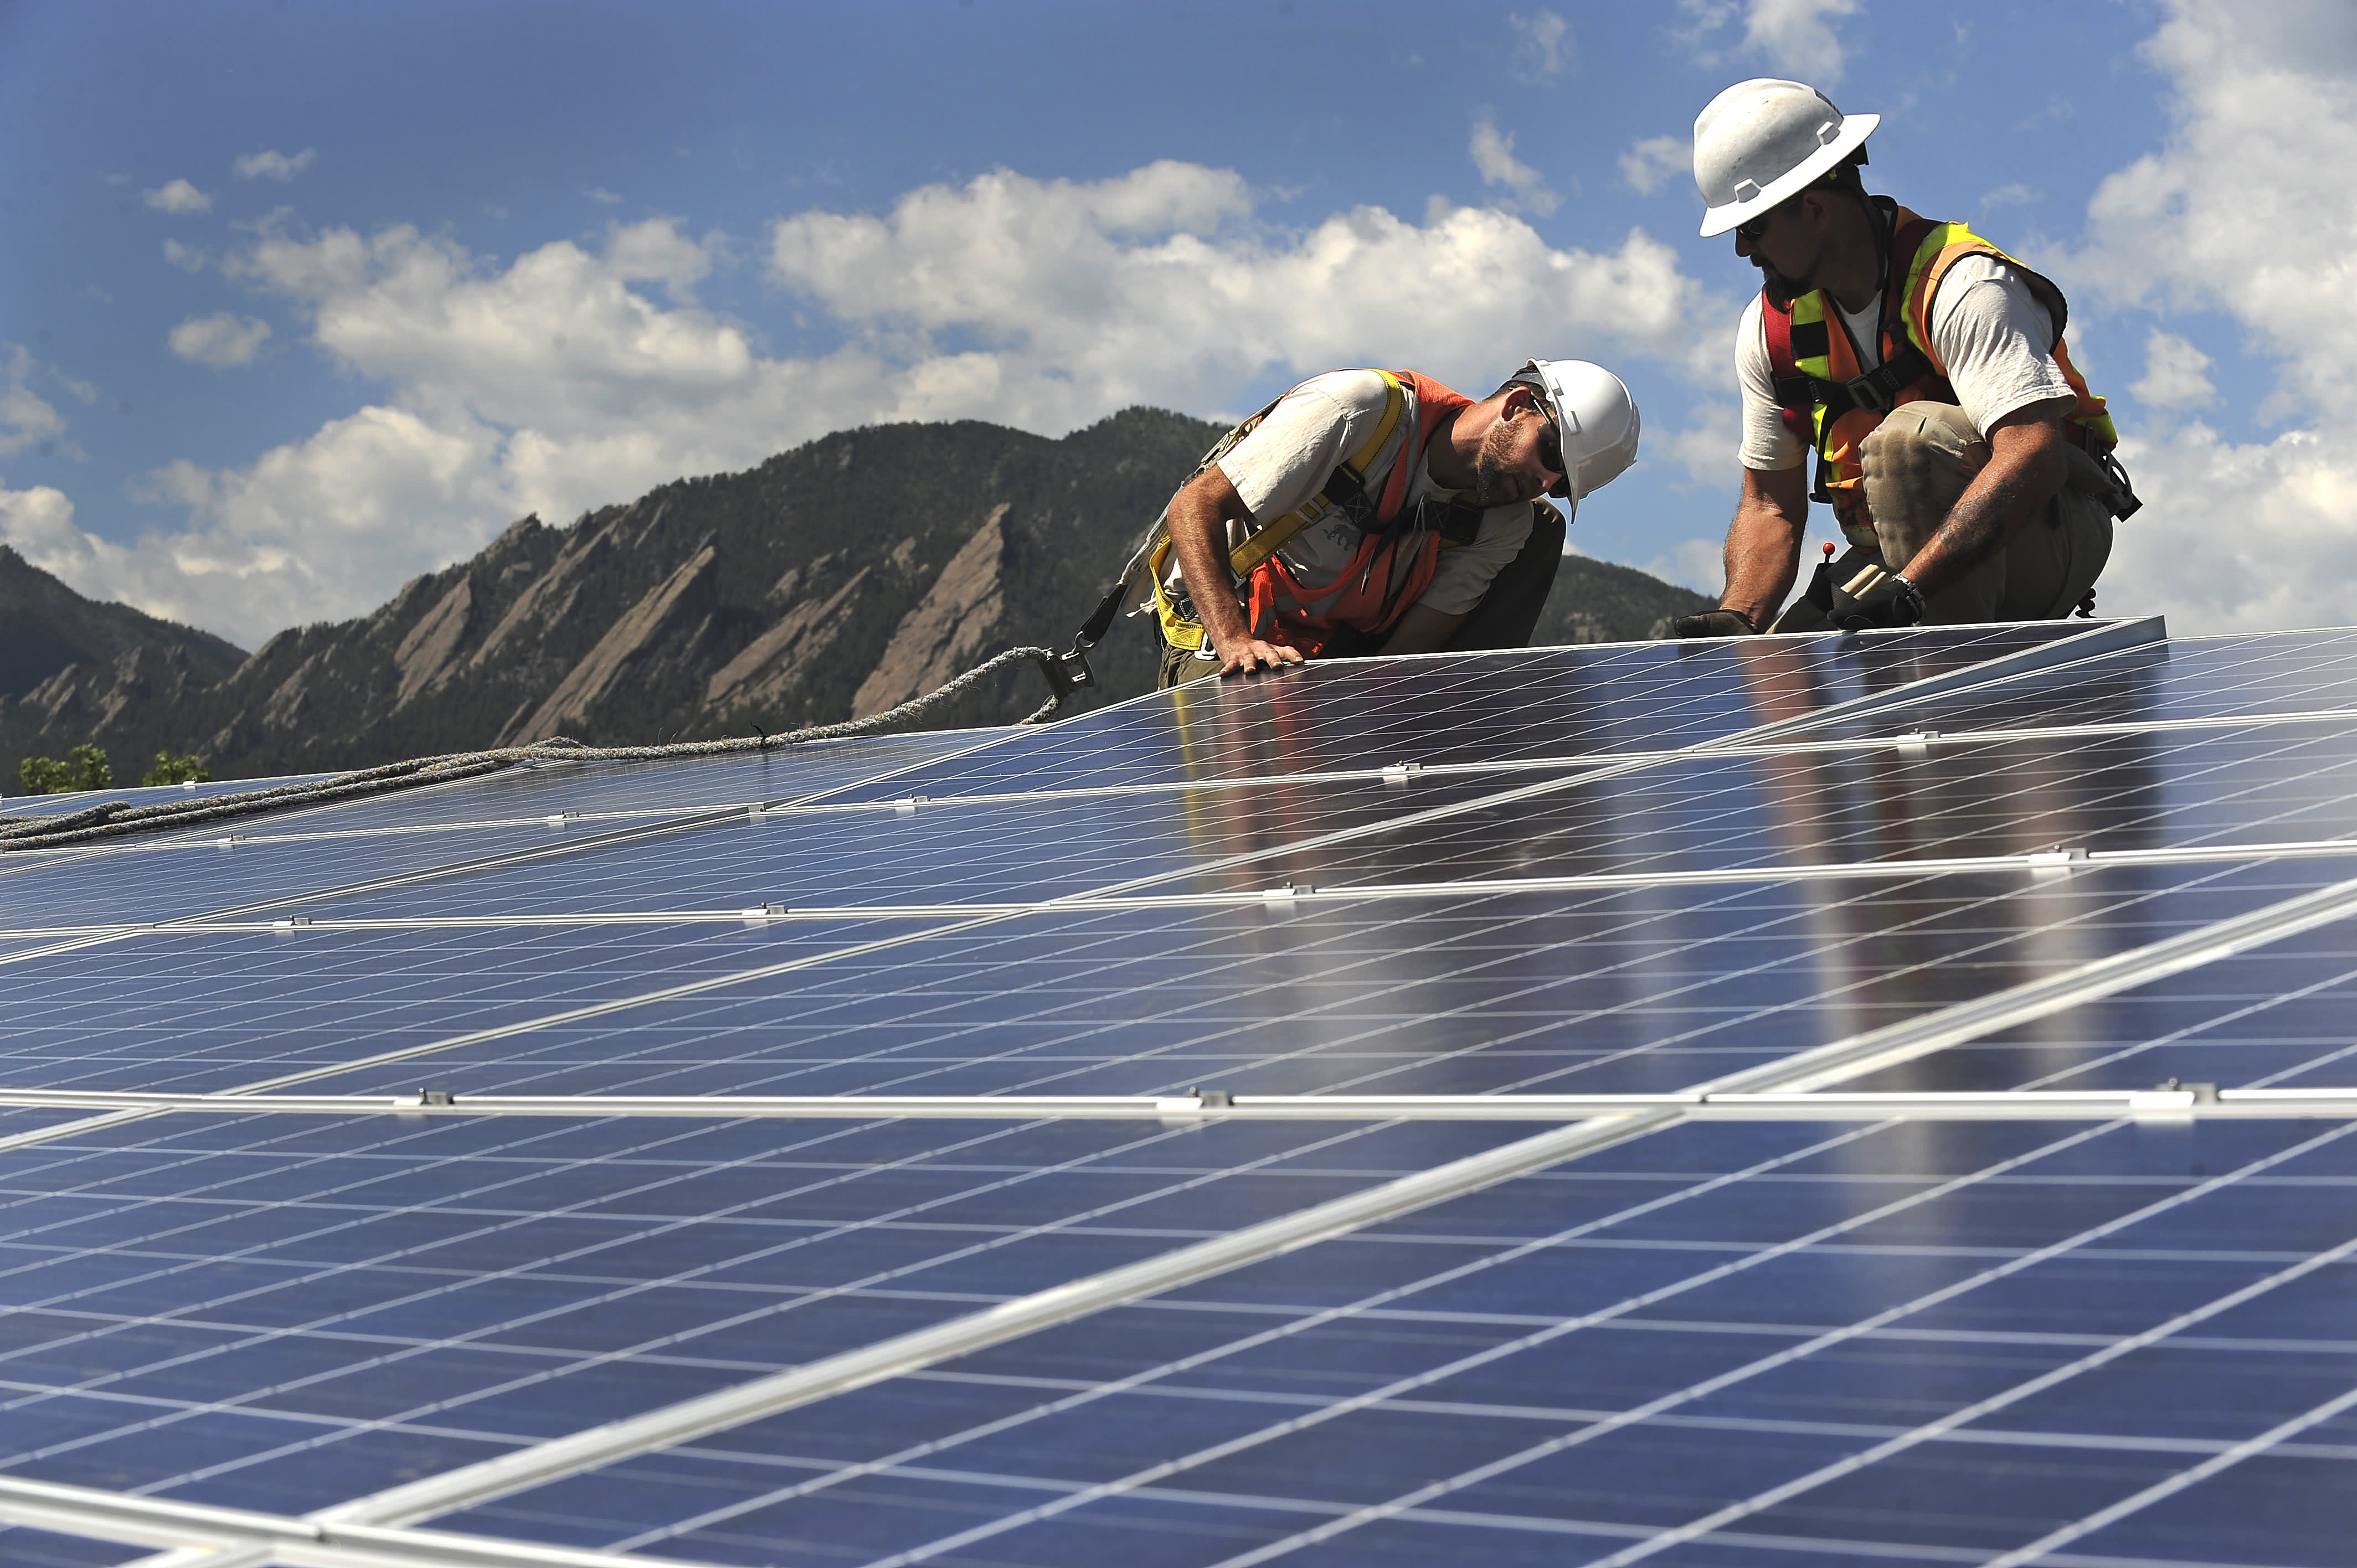 Trump's solar tariffs could slow down rapid renewable job growth